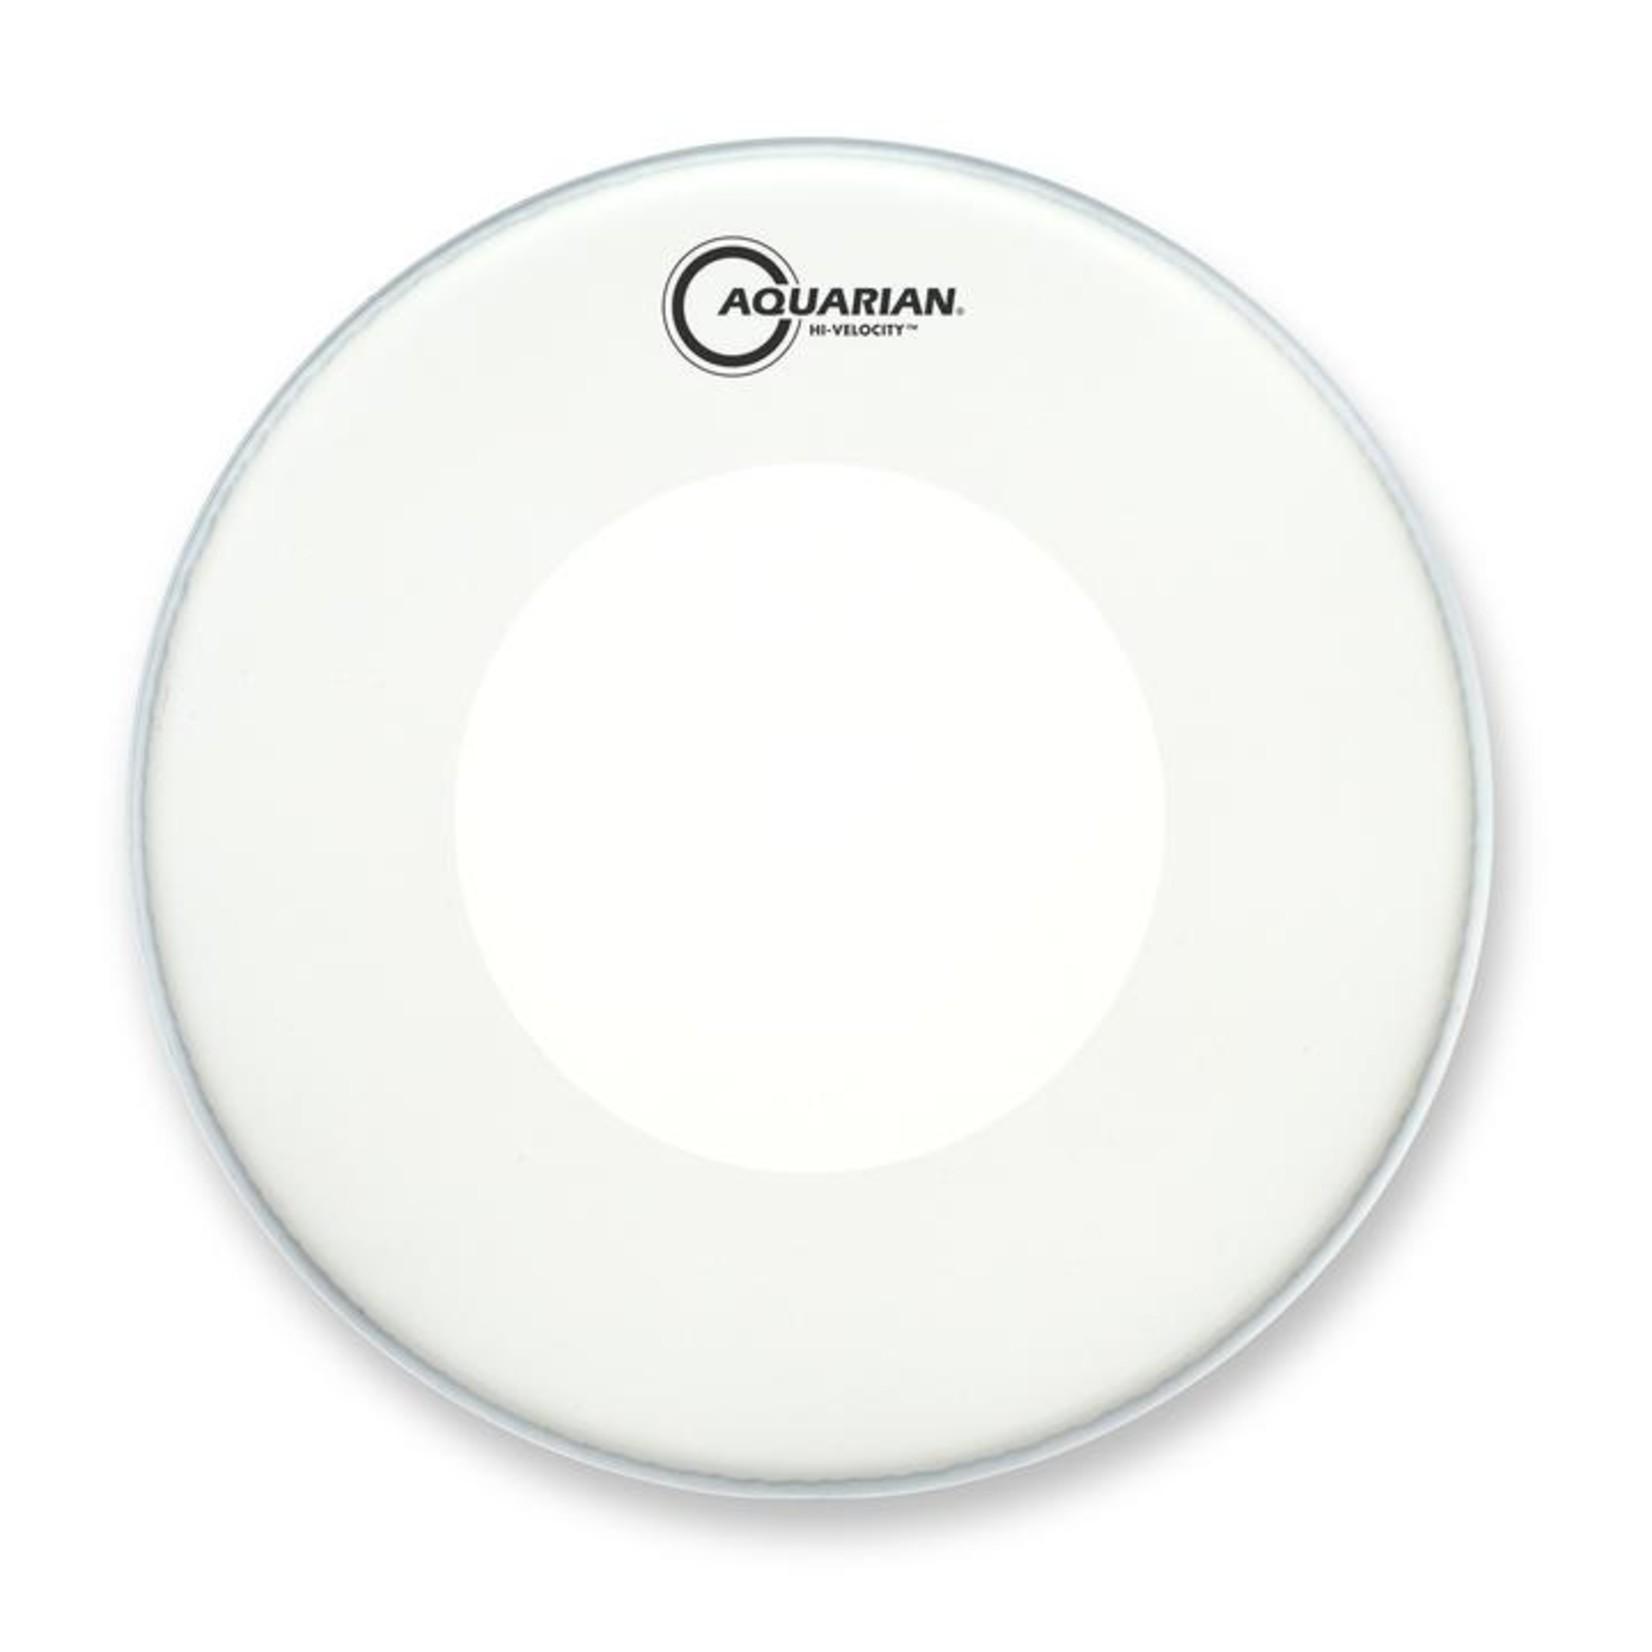 Aquarian Aquarian Hi-Velocity White Texture Coated Snare Batter